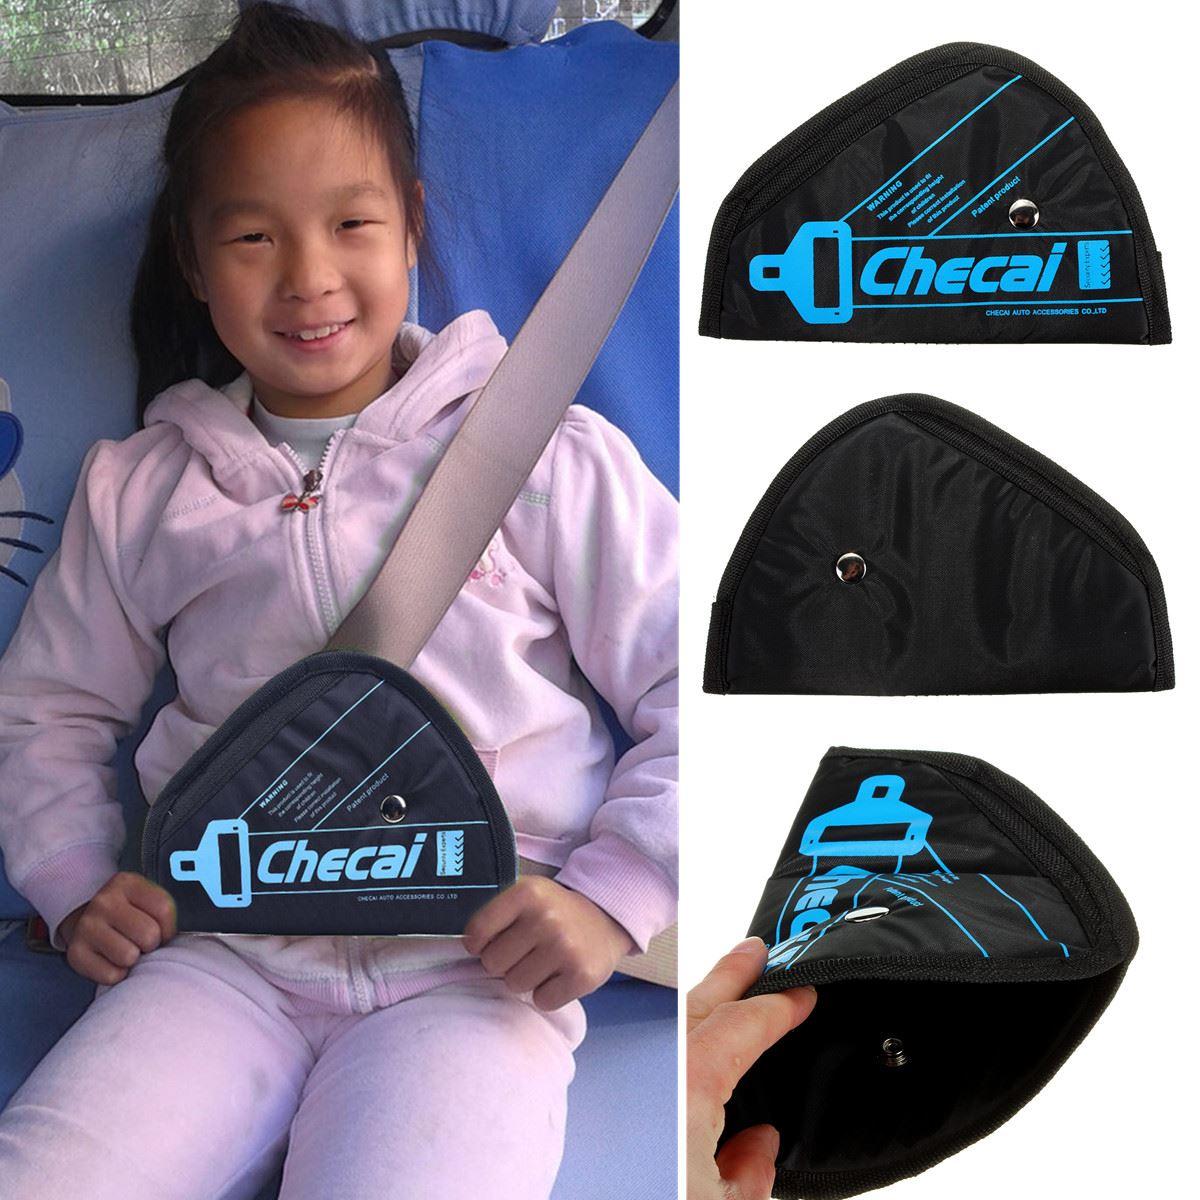 Modern Design Black Secured Beauty Fit Child Adult Parts Protecting Adjuster Toddlers Car Safety Seat Belt Kids(China (Mainland))